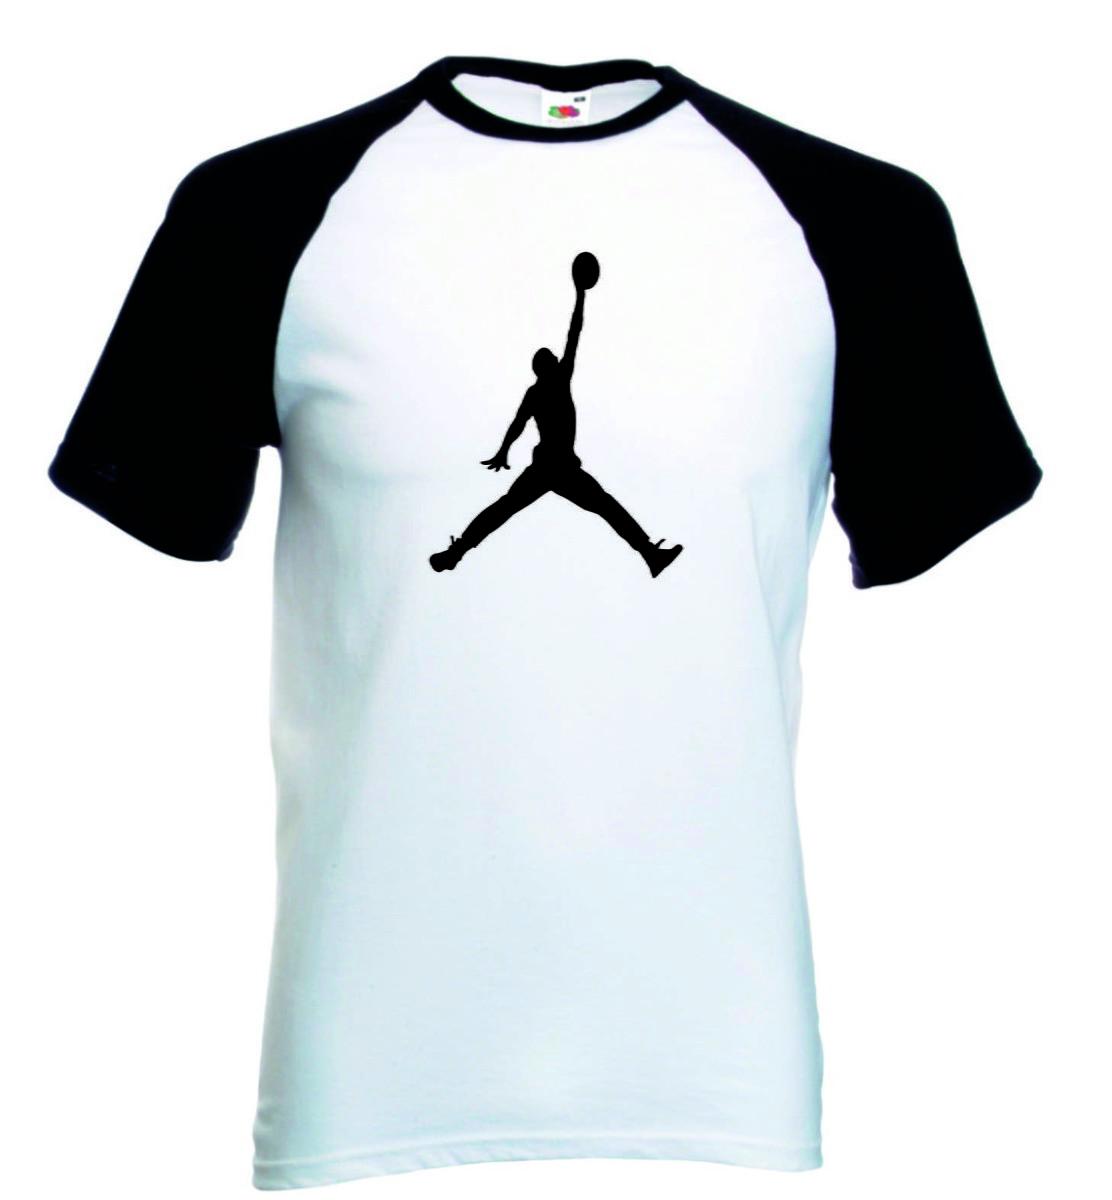 1fd3d2f6a85 Camiseta Raglan Manga Curta Jordan Basquete no Elo7